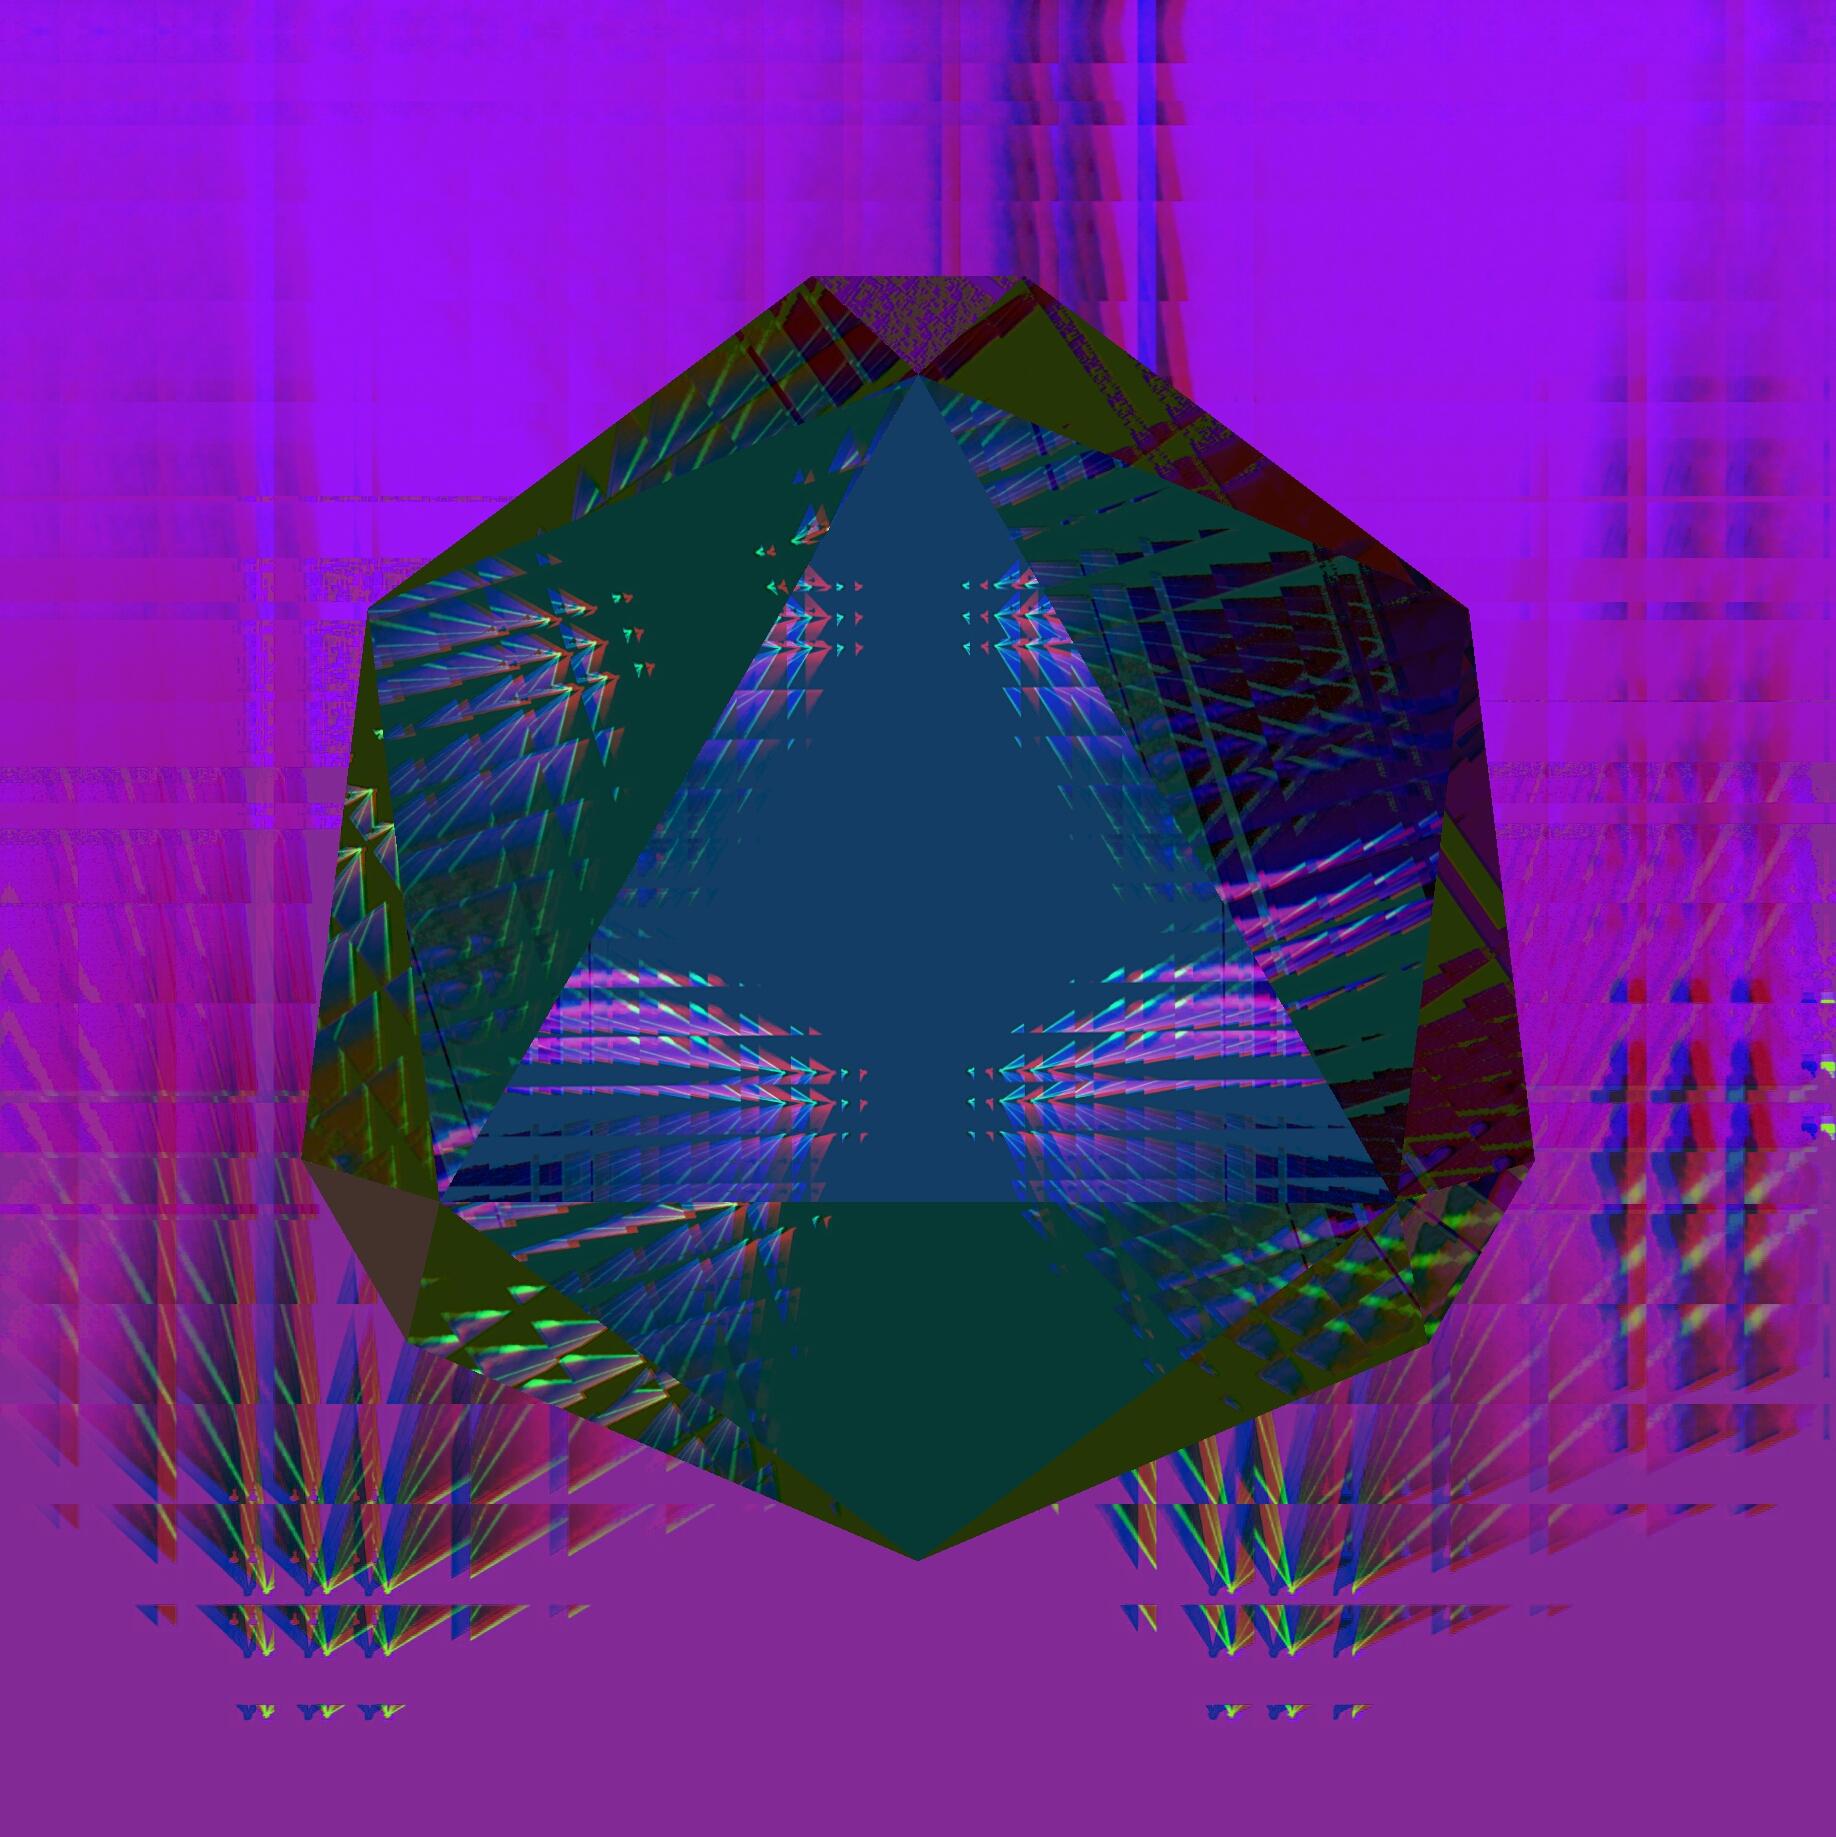 Fragment_20170208_105219